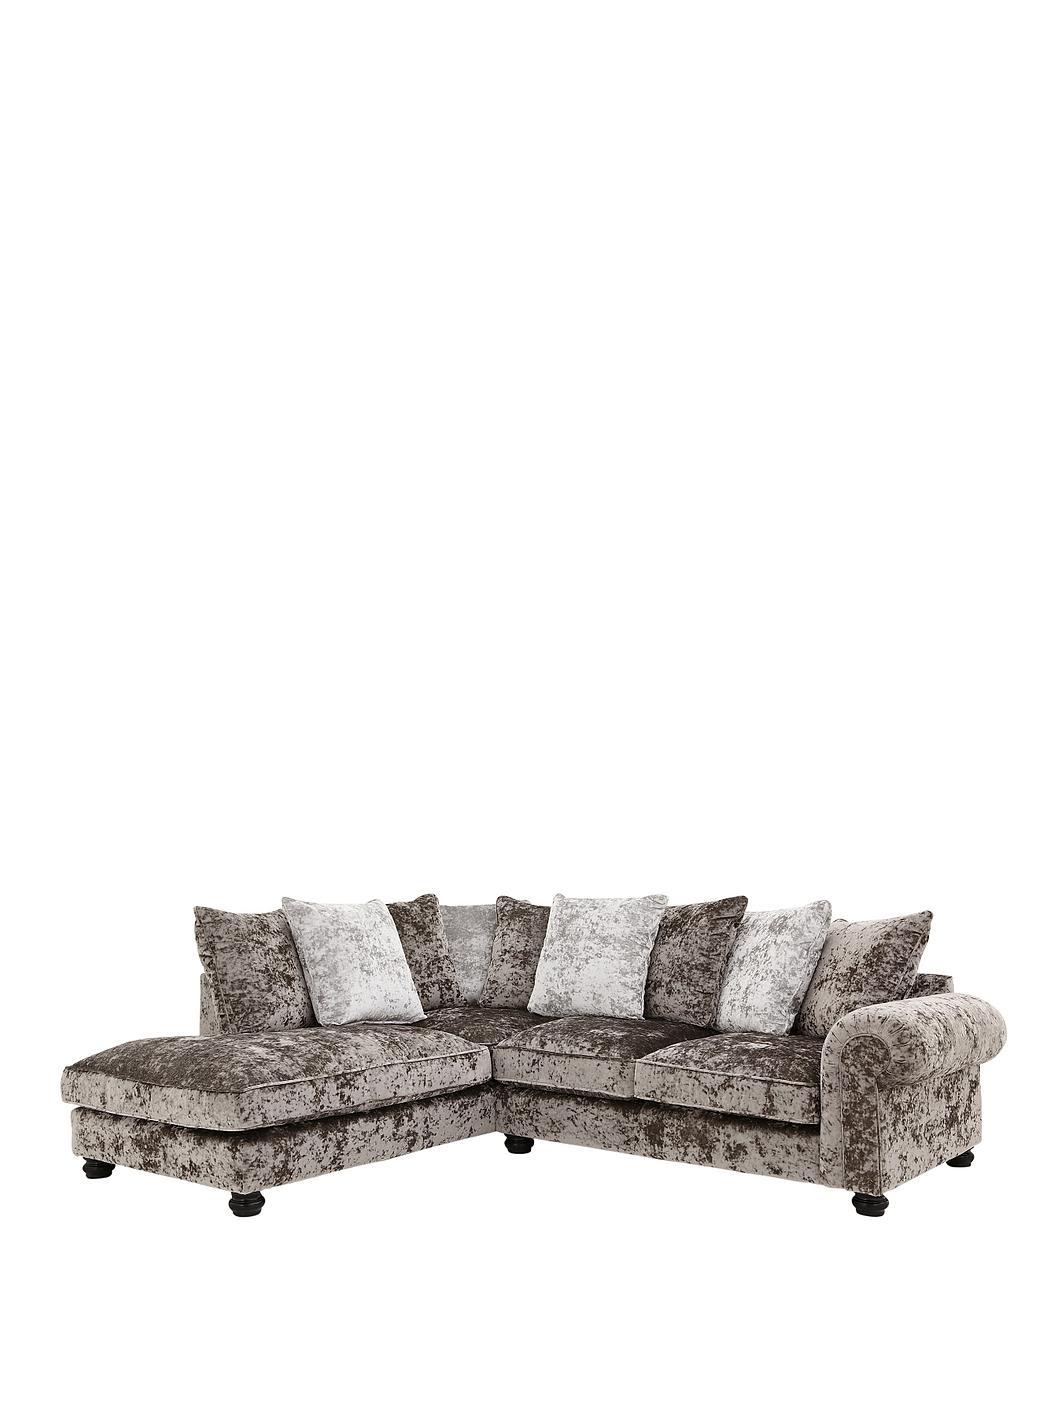 Bowen Scarpa Left Hand Fabric Corner Chaise Sofa